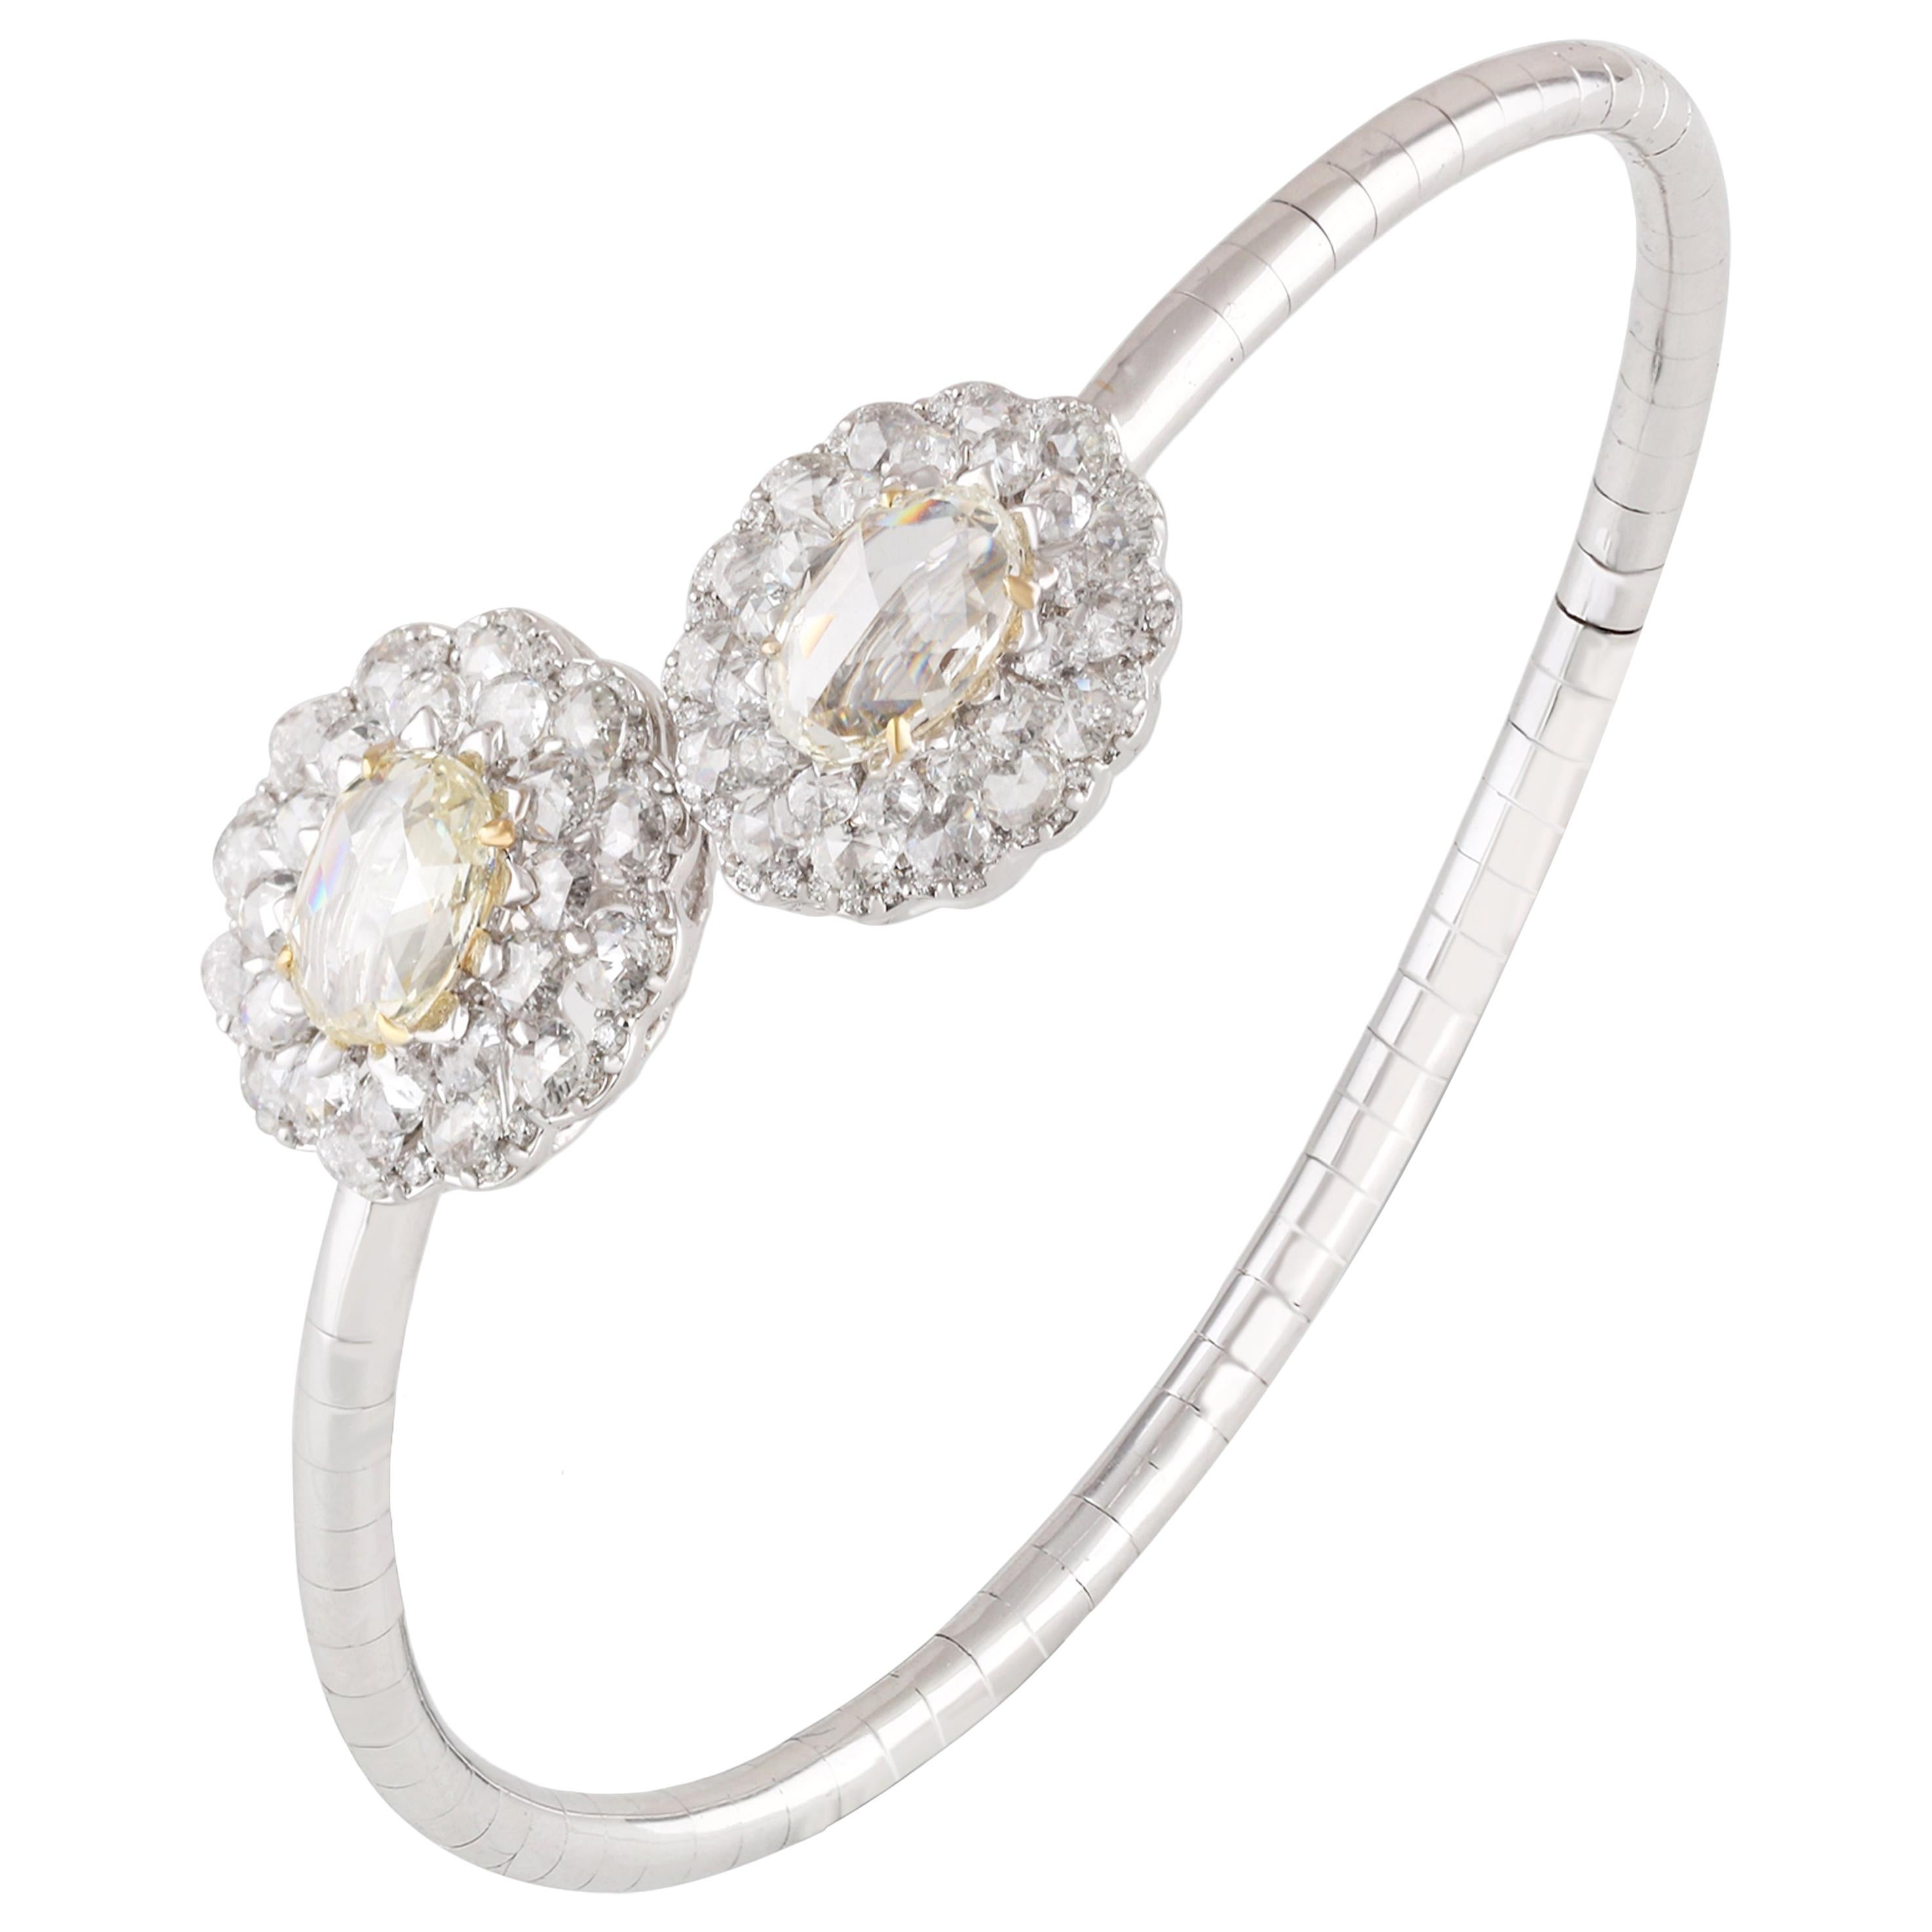 Studio Rêves Floret Rose Cut Diamond Bracelet in 18 Karat Gold